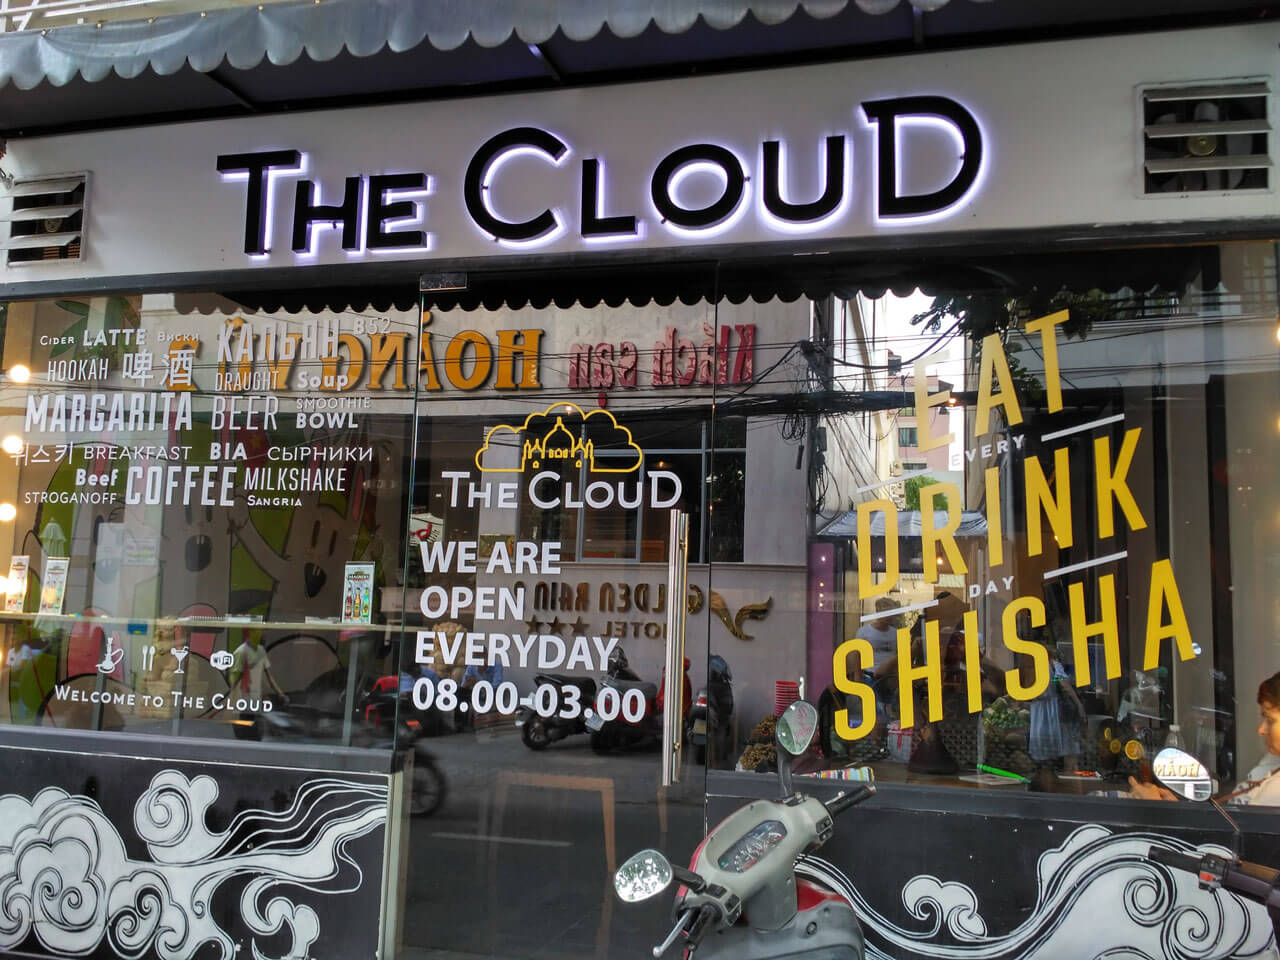 The Cloud Nha Trang